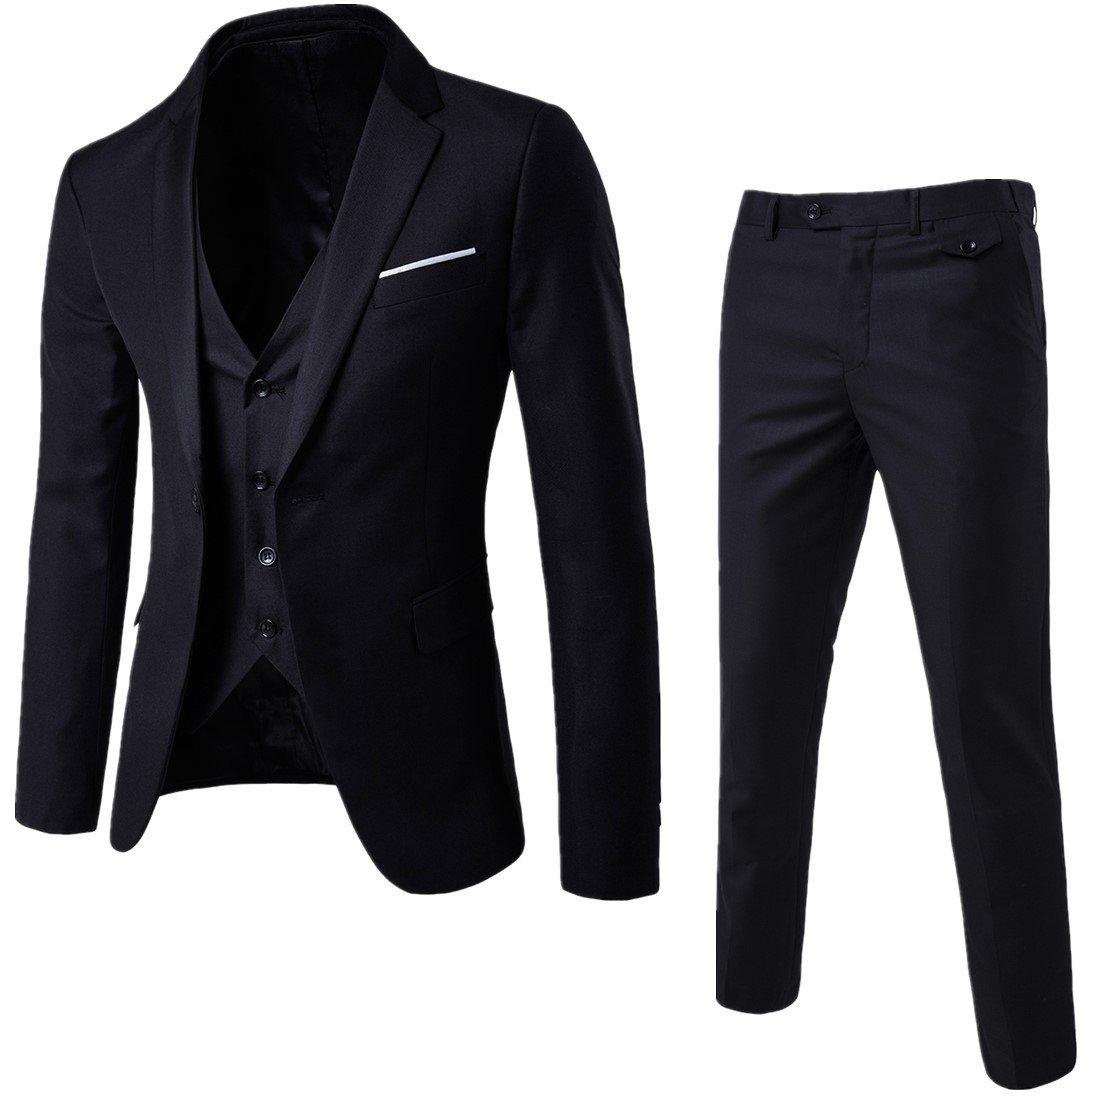 WULFUL Men's Suit Slim Fit One Button 3-Piece Suit Blazer Dress Business Wedding Party Jacket Vest & Pants Black by WULFUL